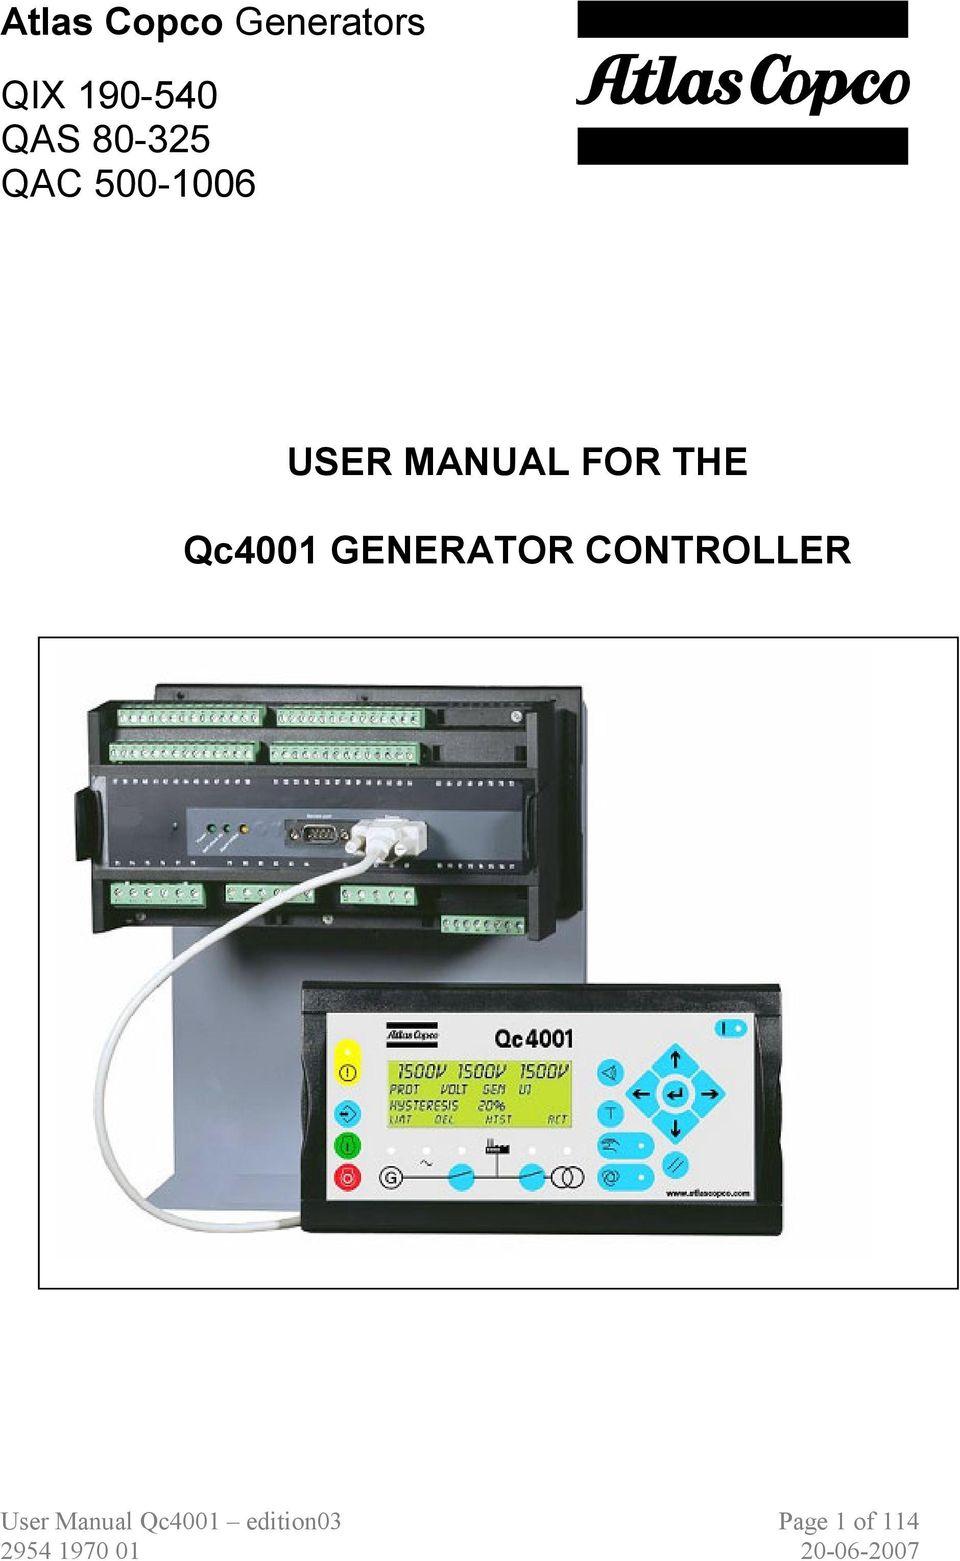 medium resolution of atlas copco generators qix qas qac user manual for the qc4001 atlas copco generator wiring diagram